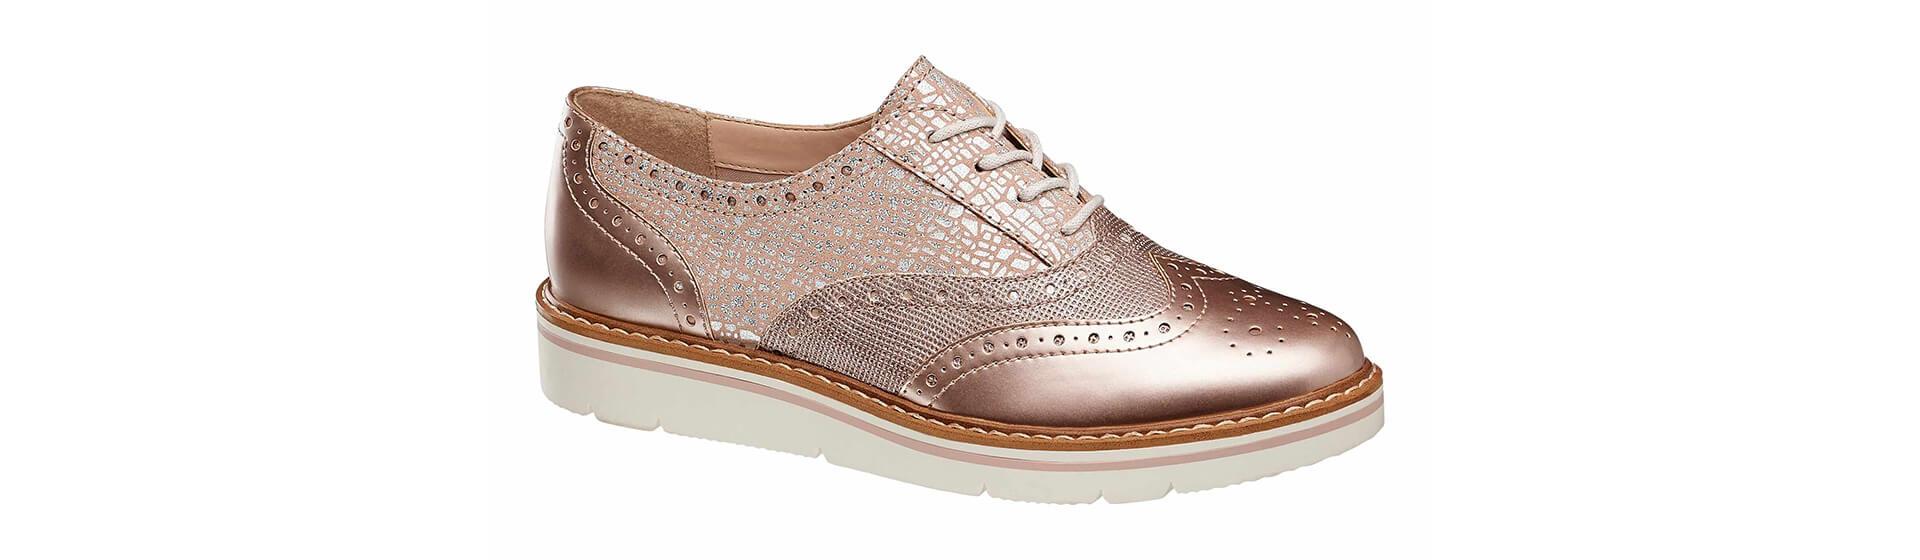 db8f3a3b735fe Precious metals: Step into the metallic shoe trend - Shoelove by ...